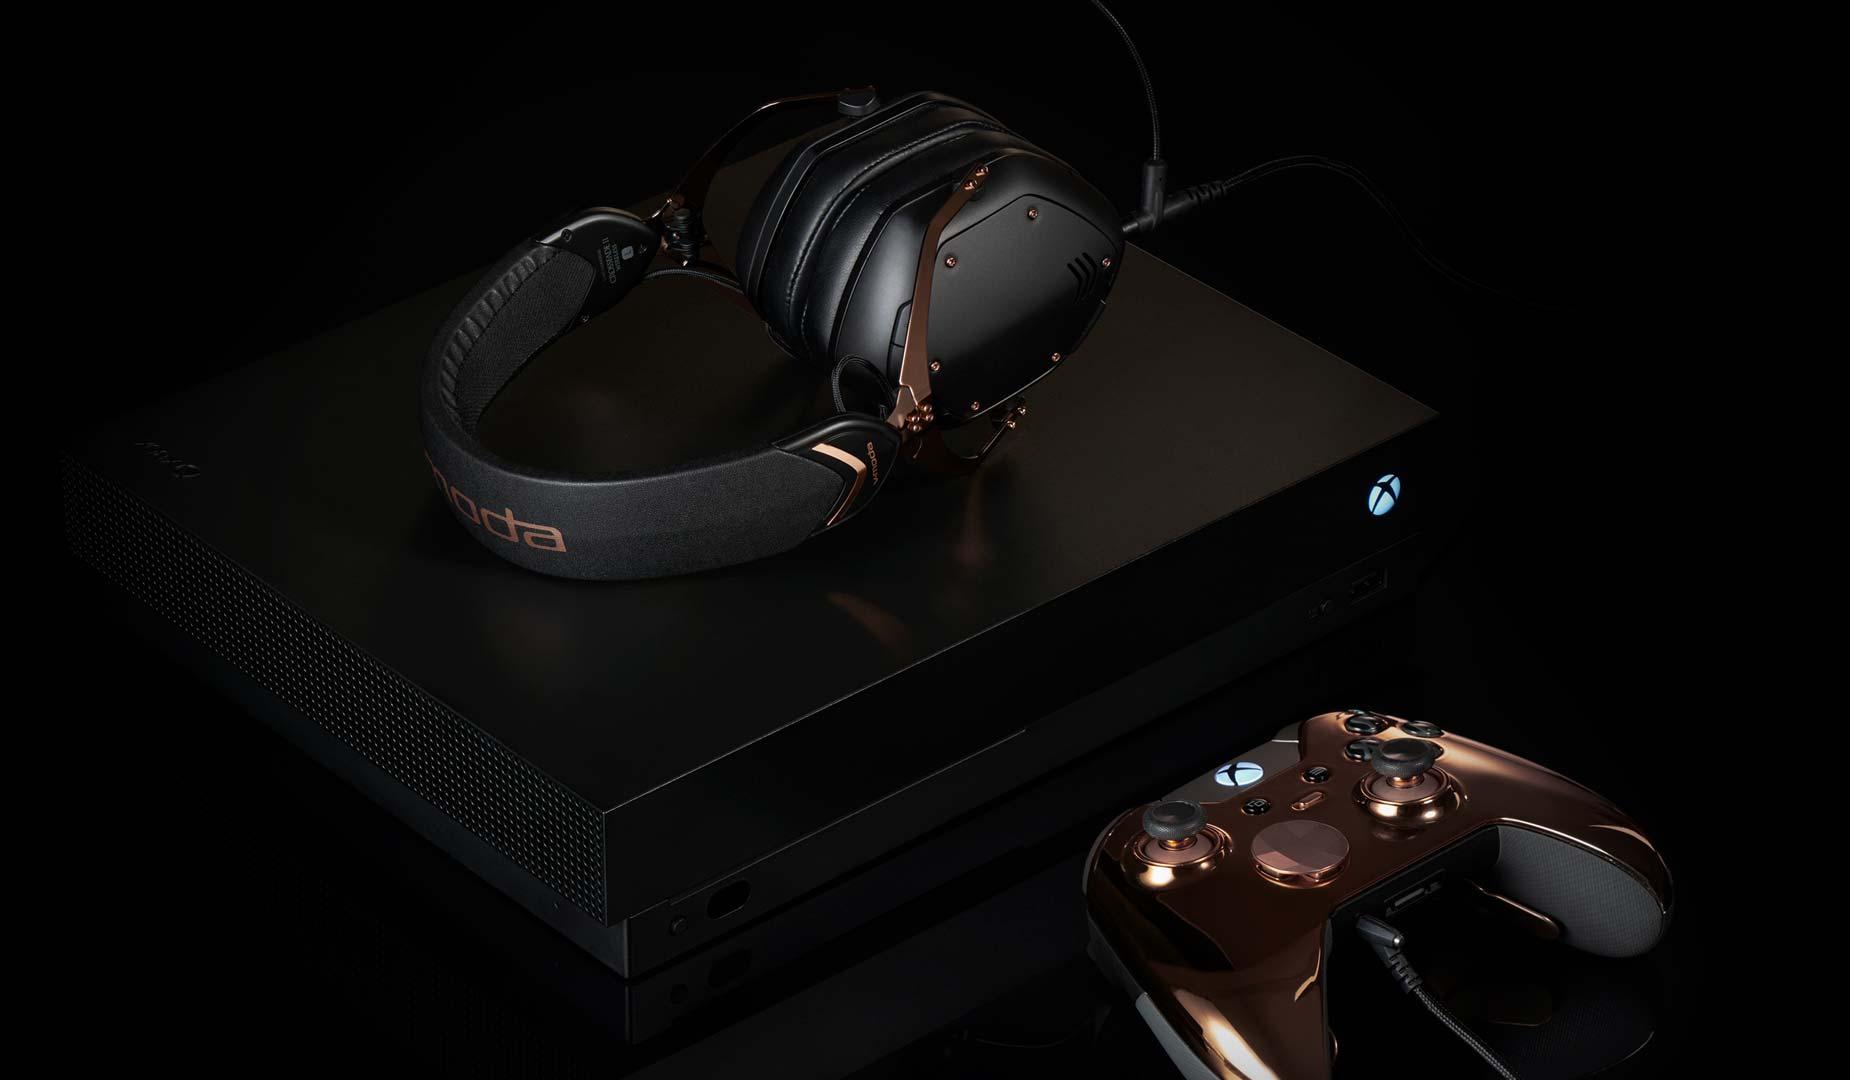 XF2W XBOX Gaming